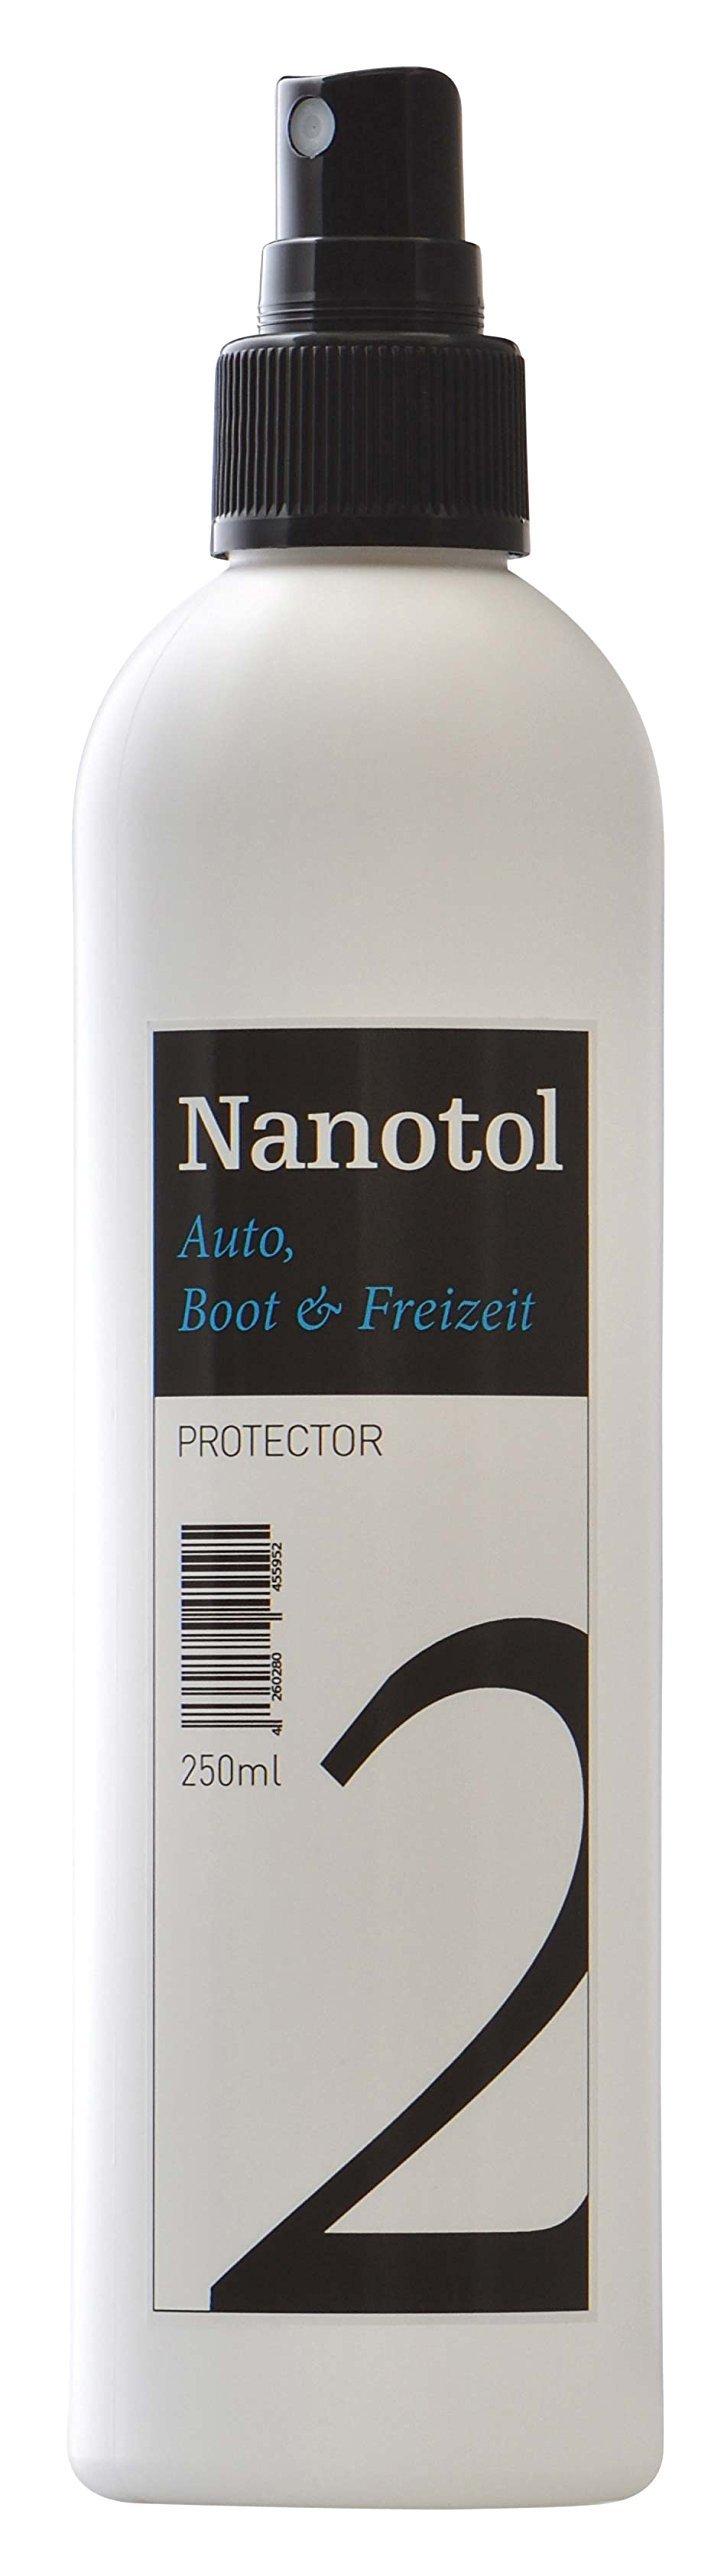 Auto Boot Freizeit - Nanotol Protector